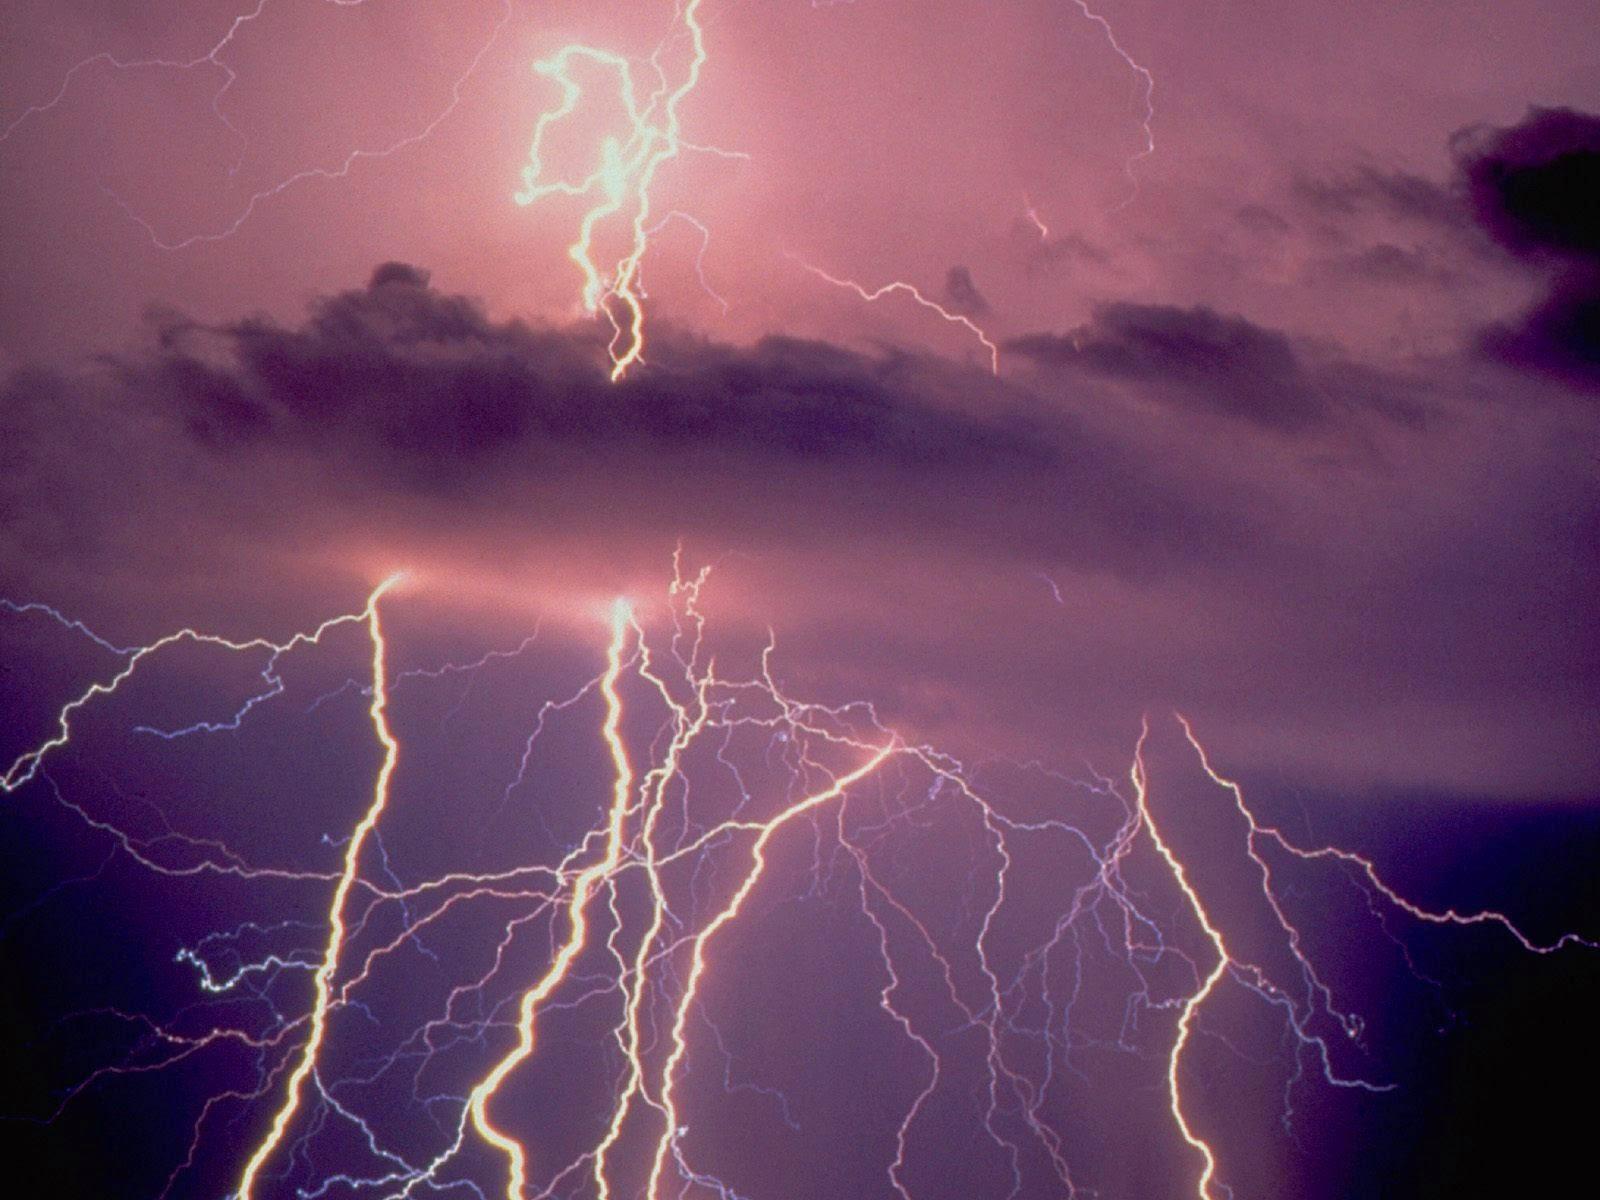 So Bad Thunder Kills Three Teenagers in Ogun State